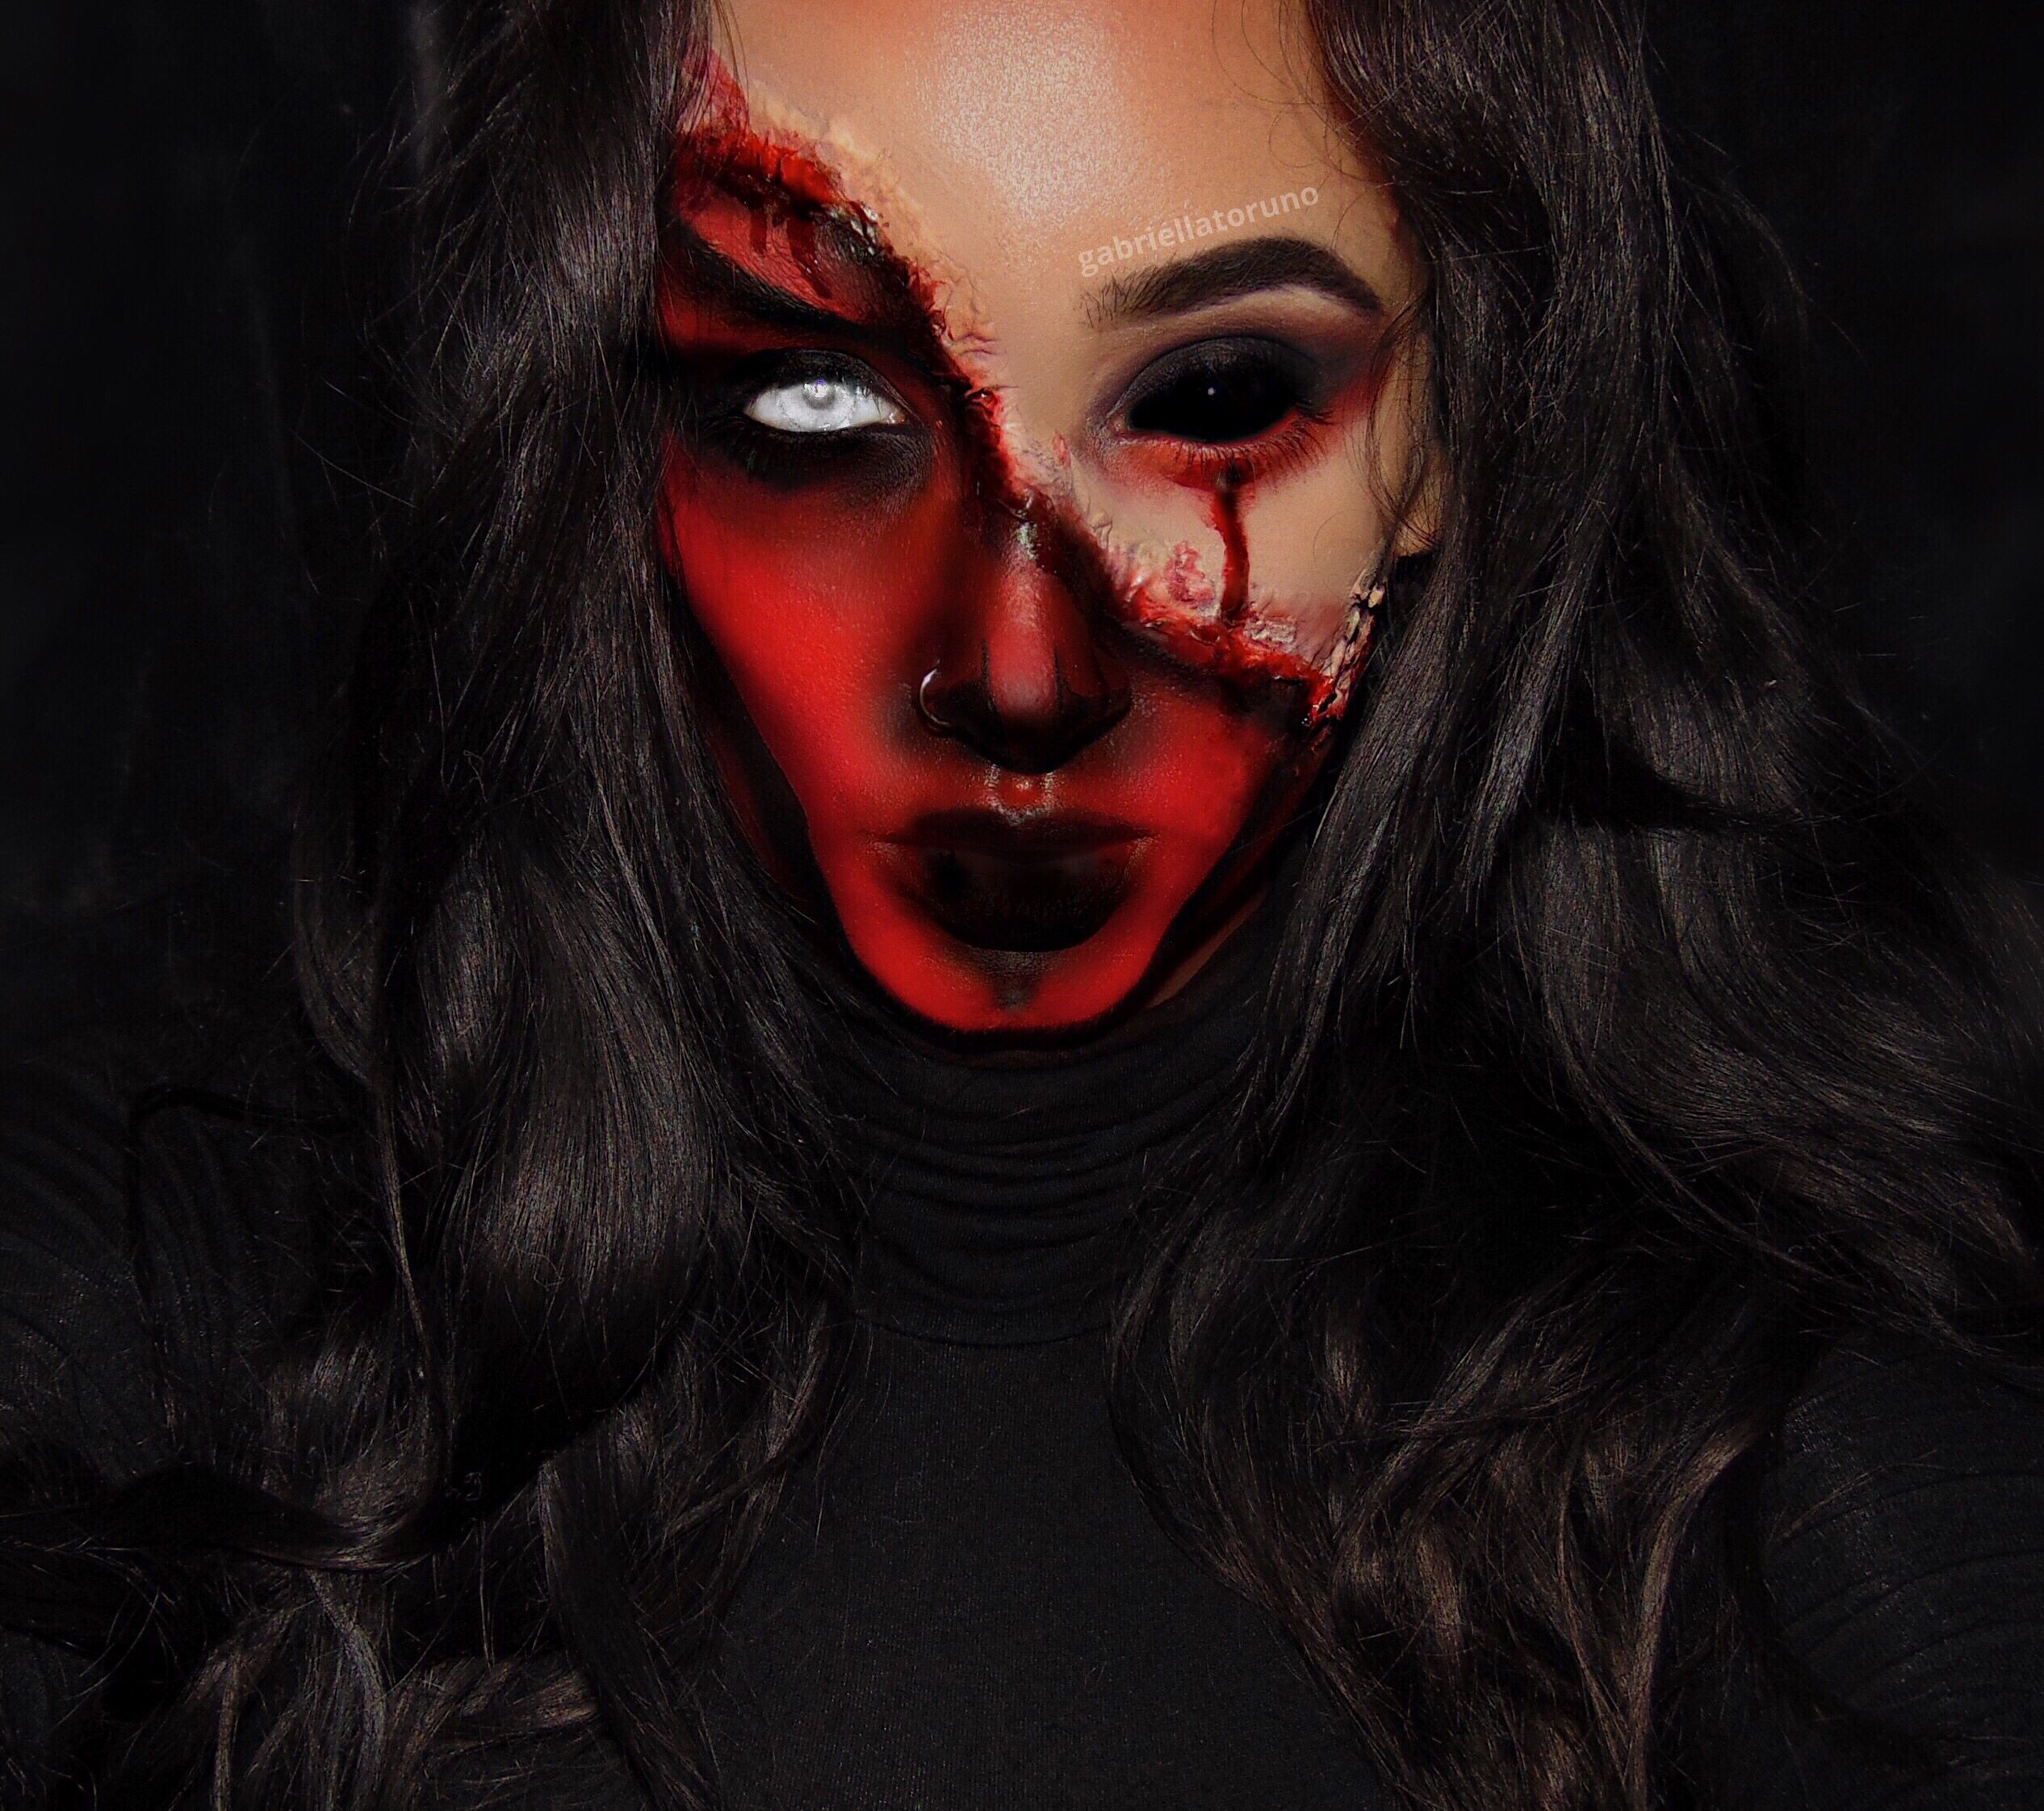 Gabriella Toruno Halloween Makeup Scary Demons Halloween Makeup Amazing Halloween Makeup